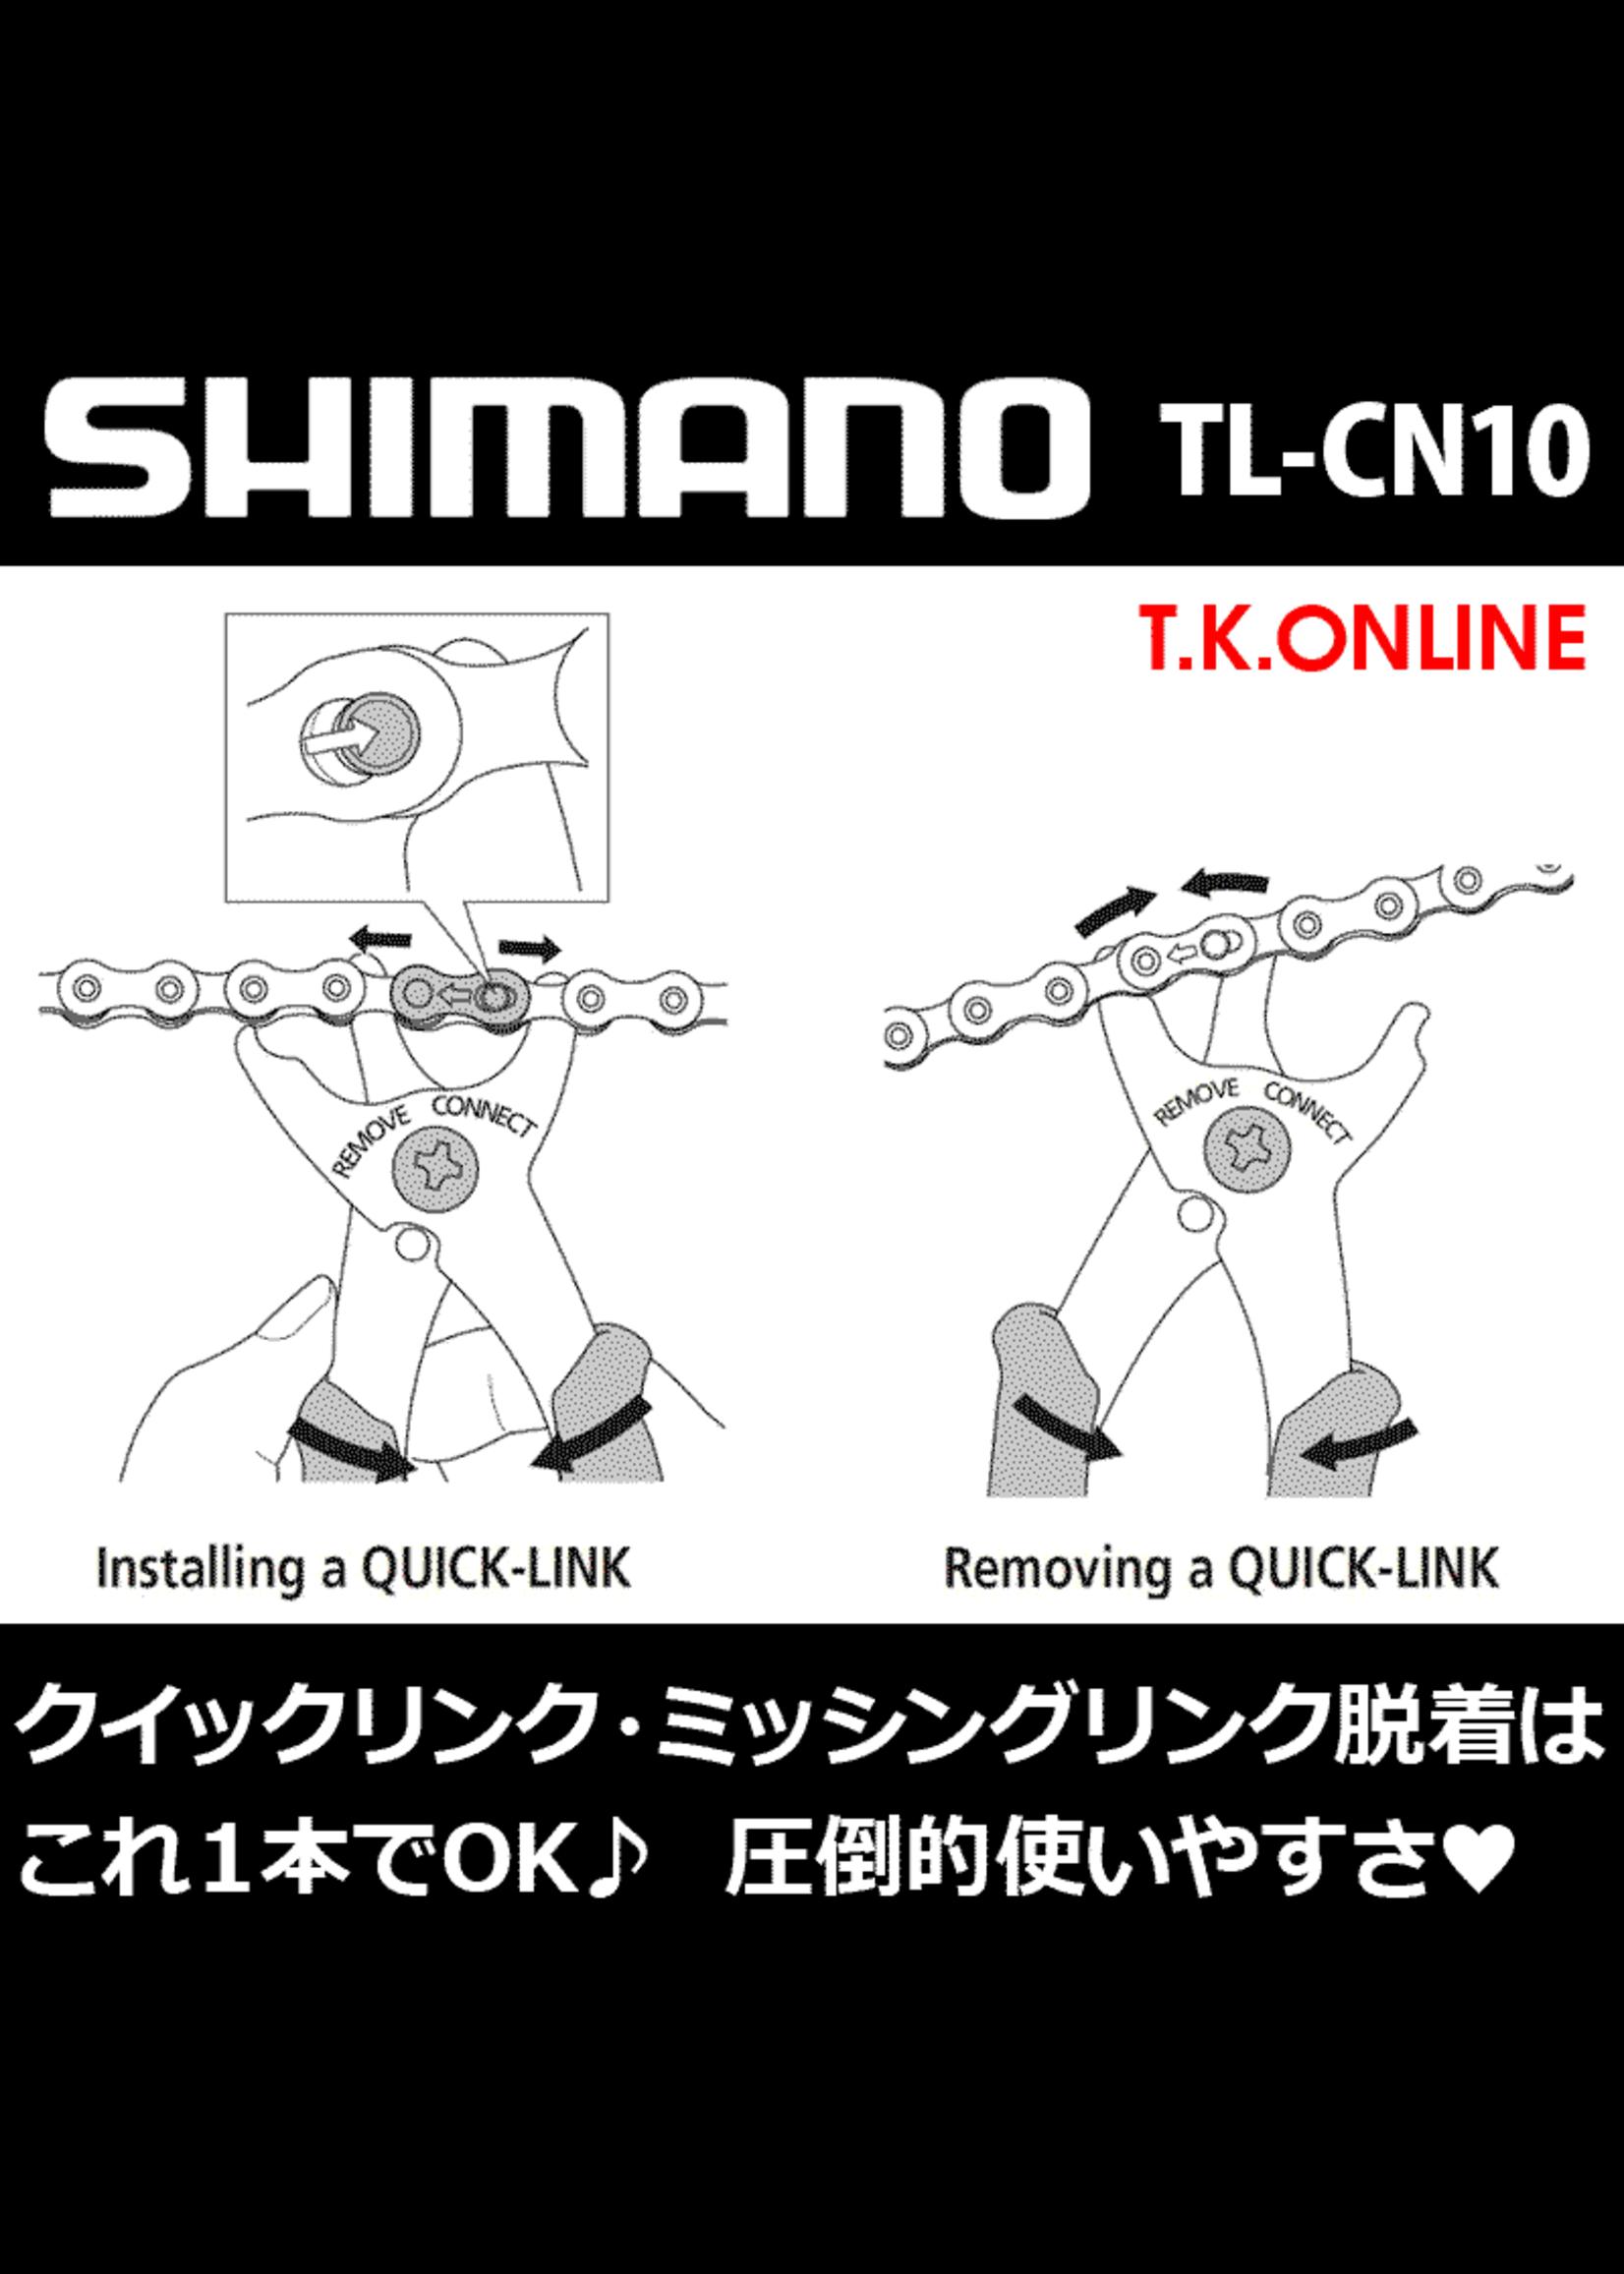 Shimano Shimano TL-CN10 QUICK LINK TOOL